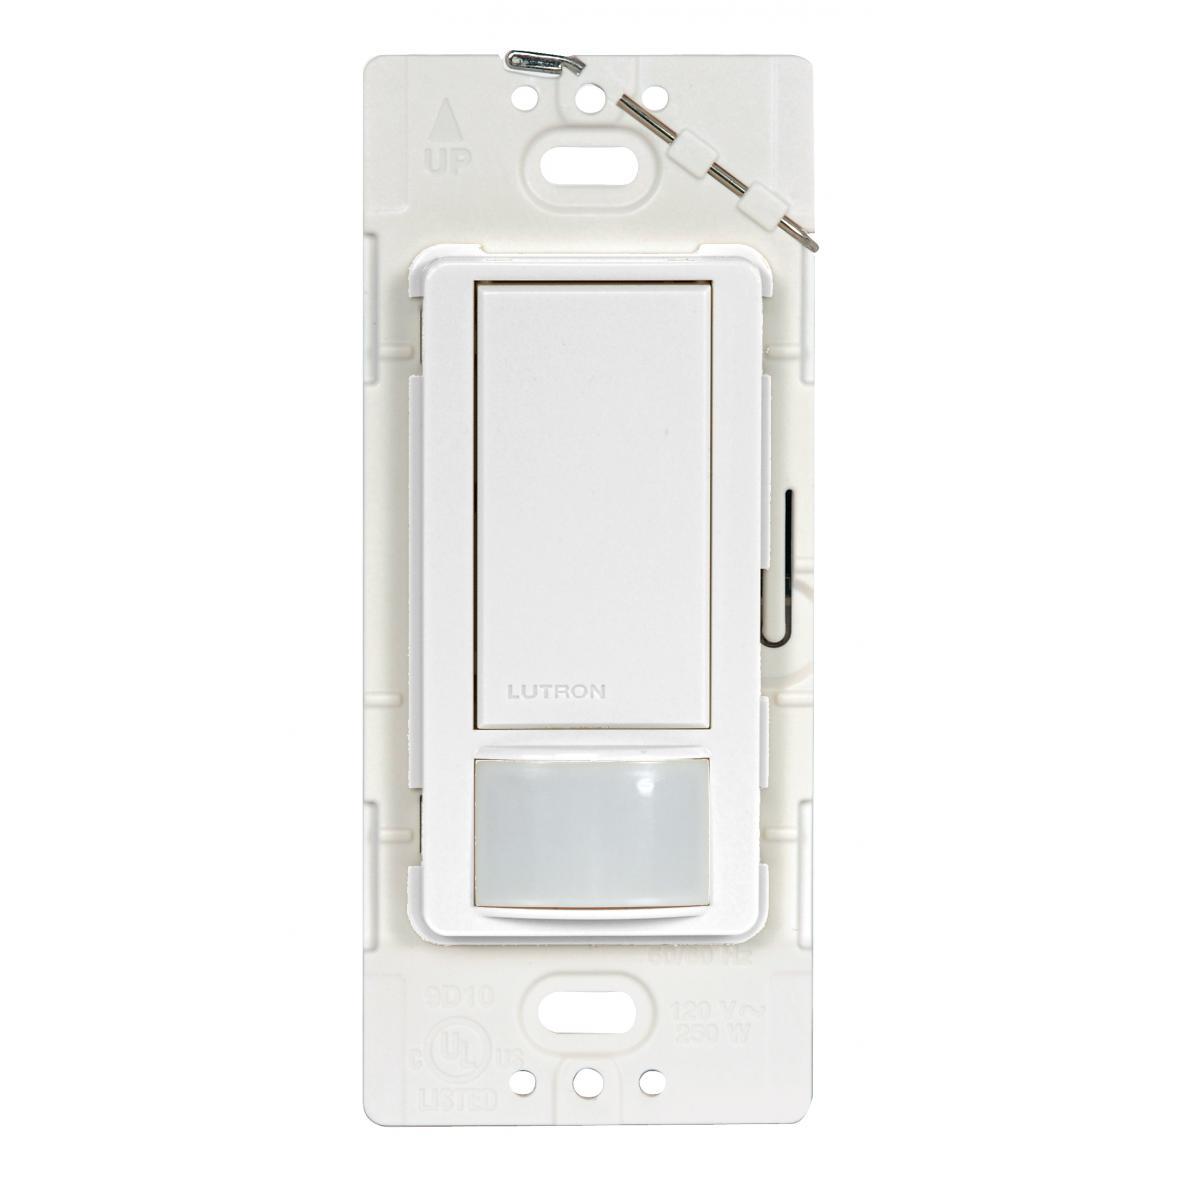 occupancy sensor switch New York New Jersey